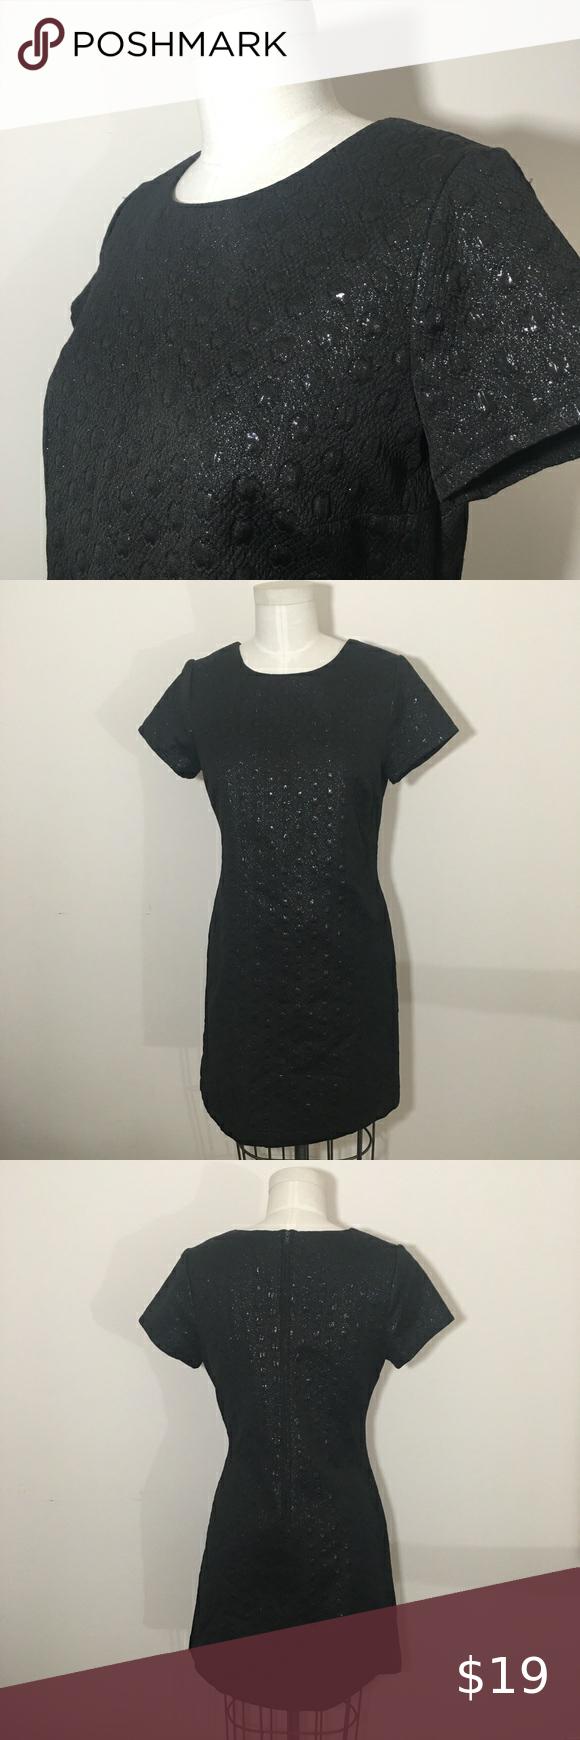 Xhilaration Target Juniors Black Dress Lg Gorgeous Textured Little Black Dress Short Sleeves Back Zipper Black Lurex Black Dress Black Short Dress Dresses [ 1740 x 580 Pixel ]